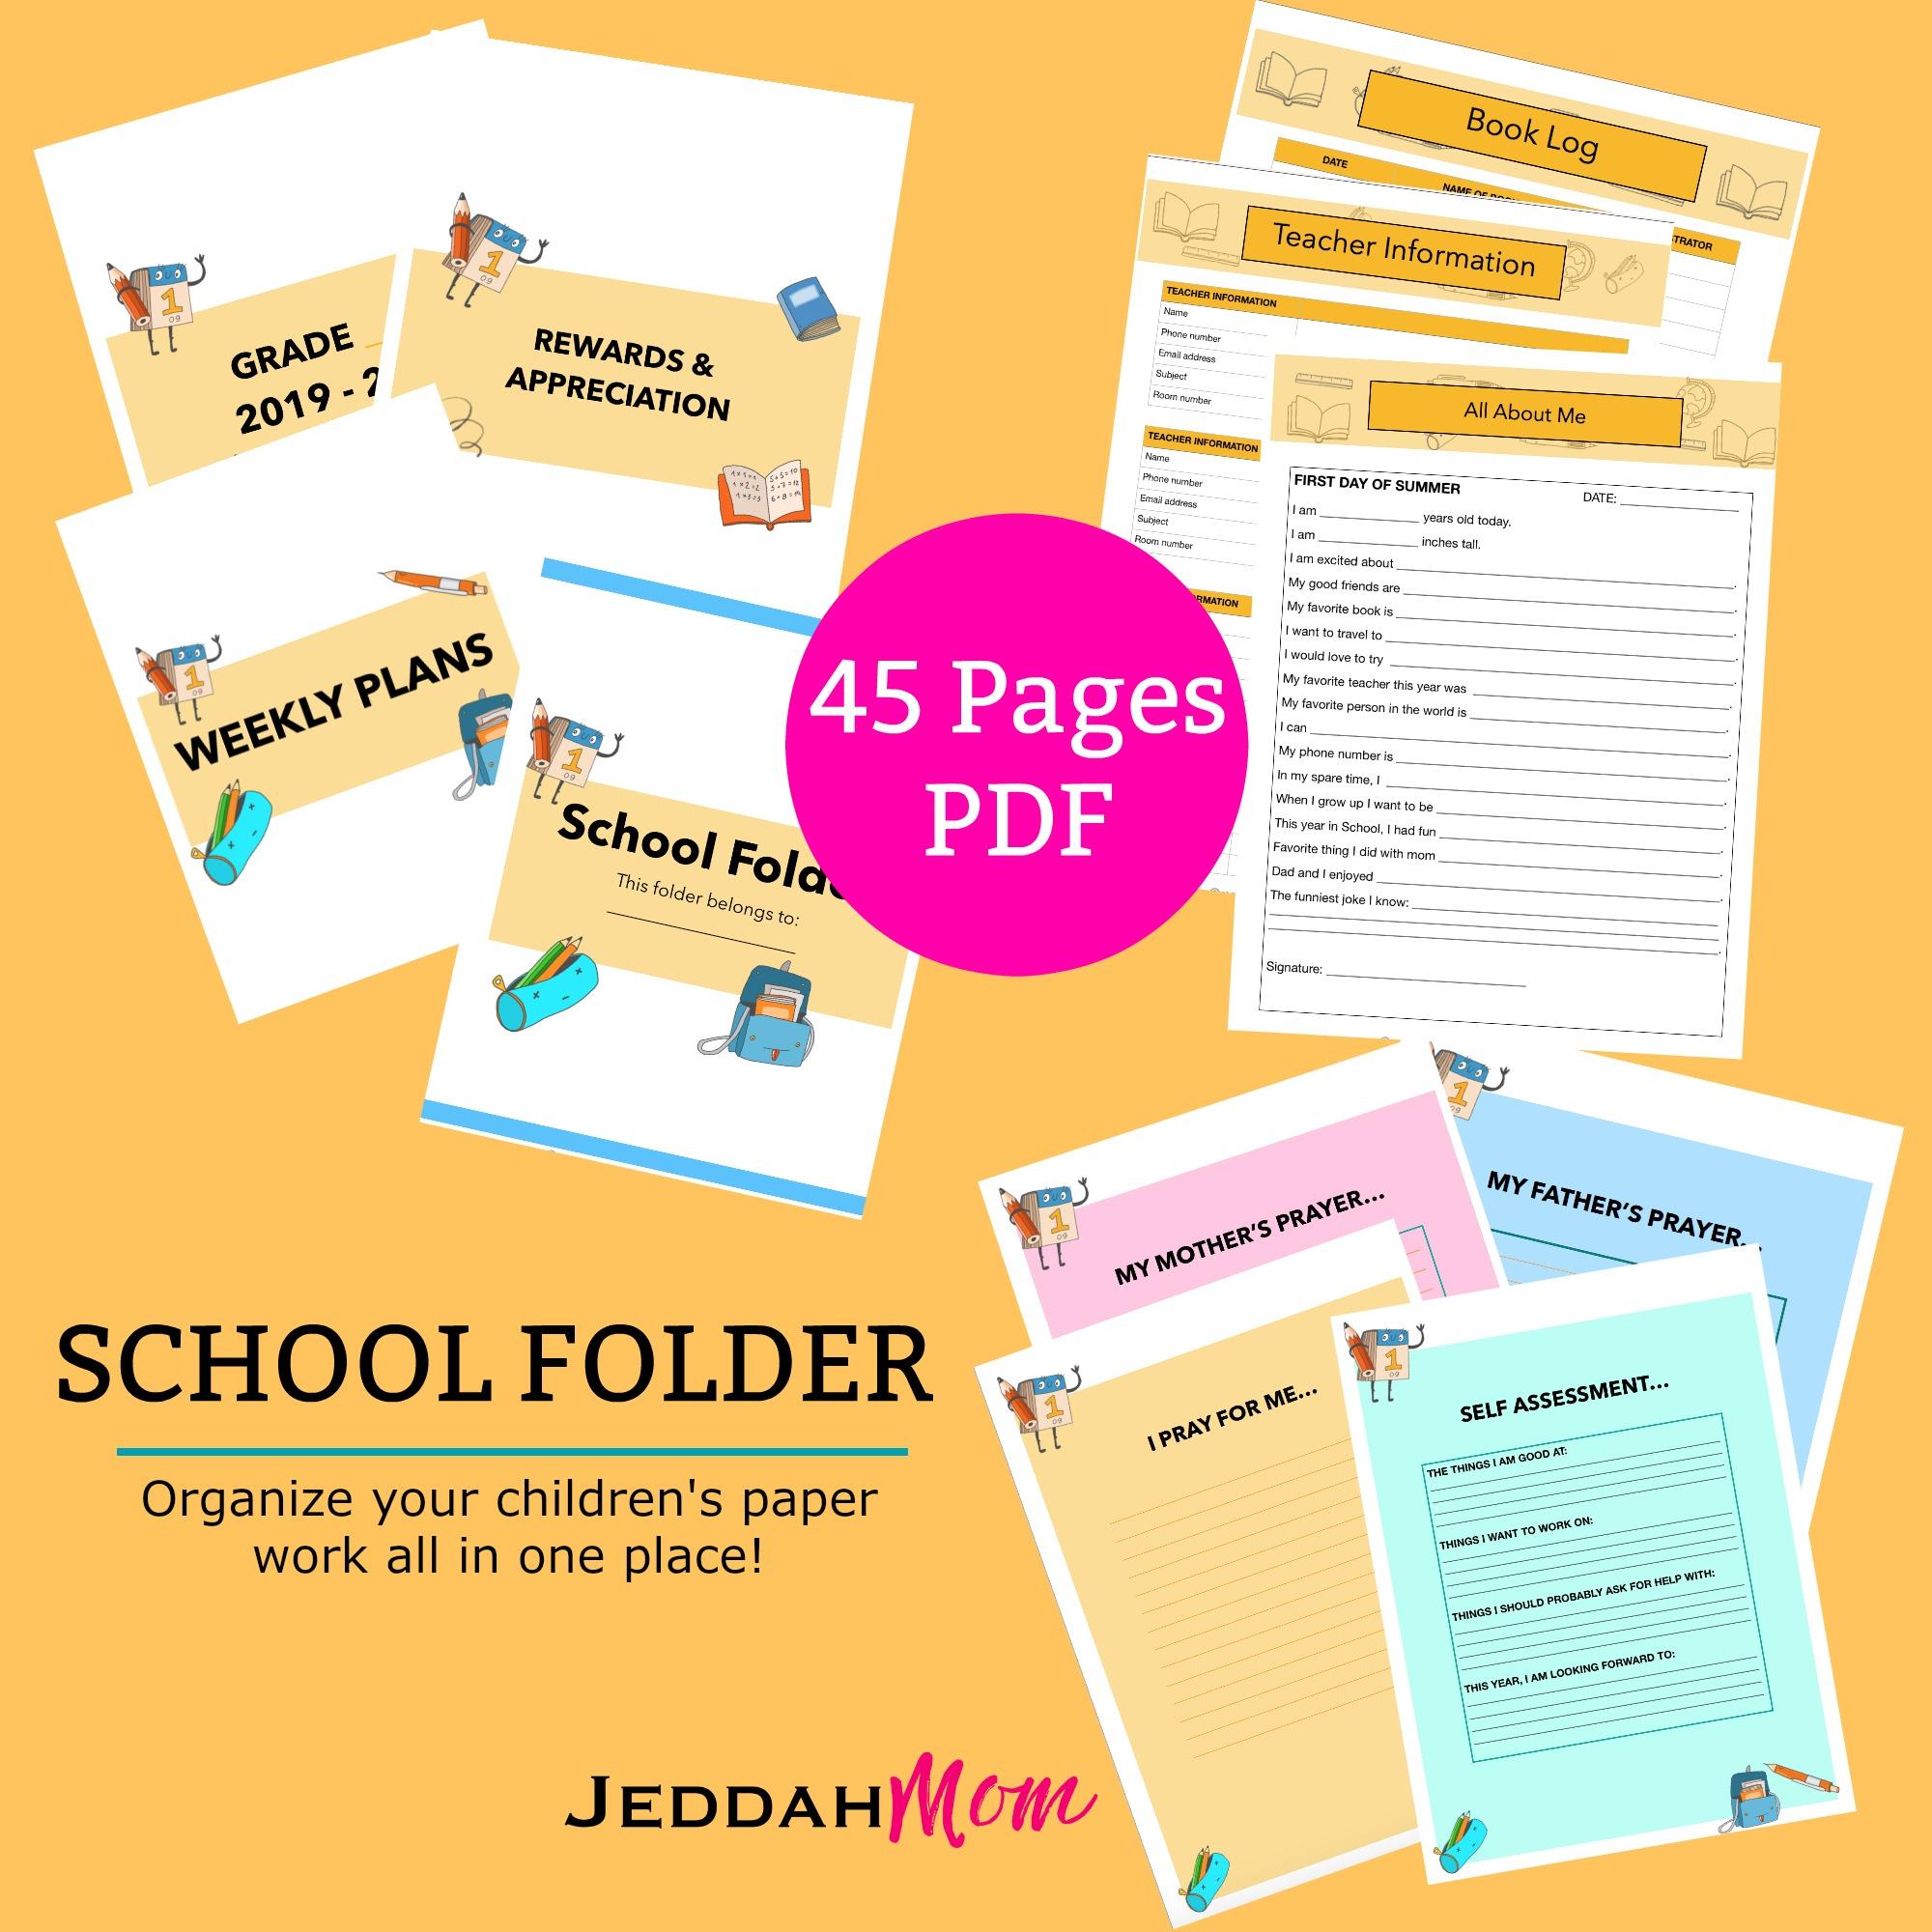 School Folder organize school paper clutter JeddahMom